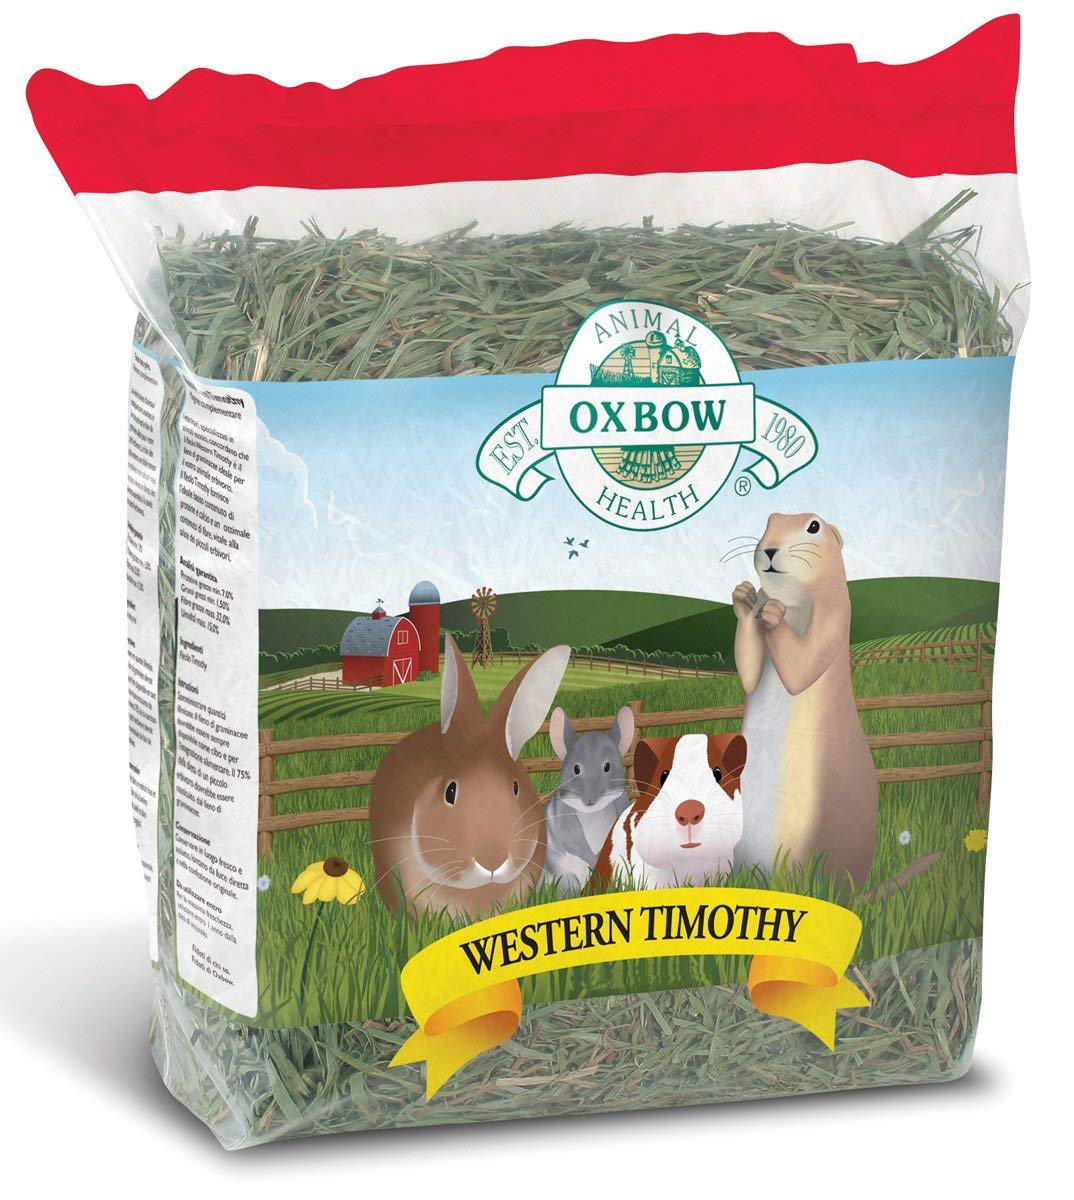 Oxbow Western Timothy Hay Dry Small Animal Food, 50 lbs.